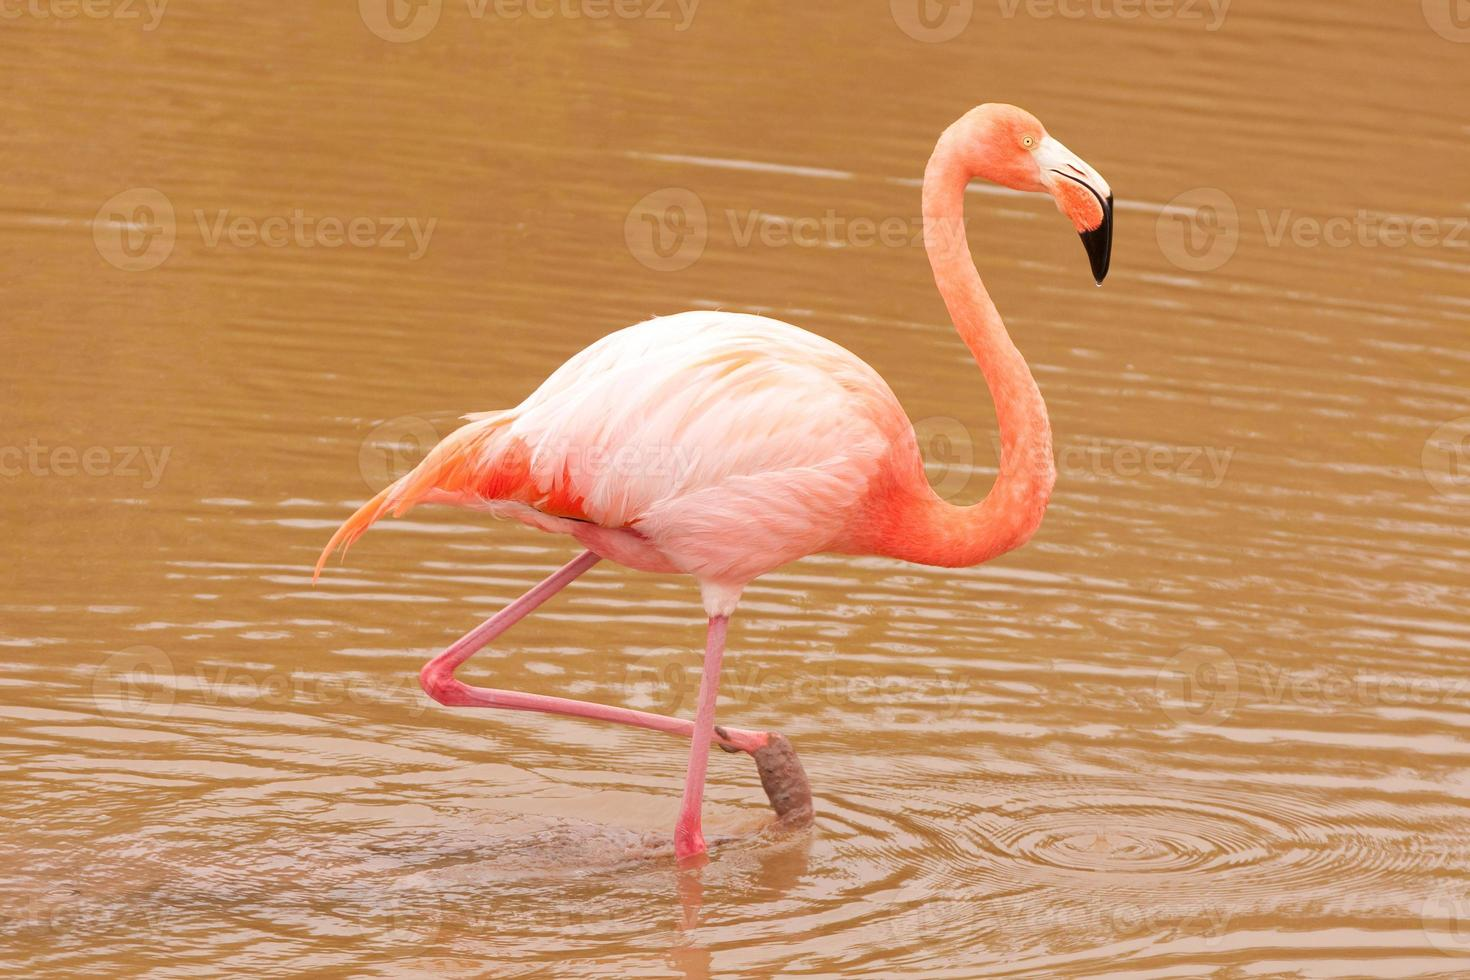 flamenco rosado (phoenicopterus ruber) foto